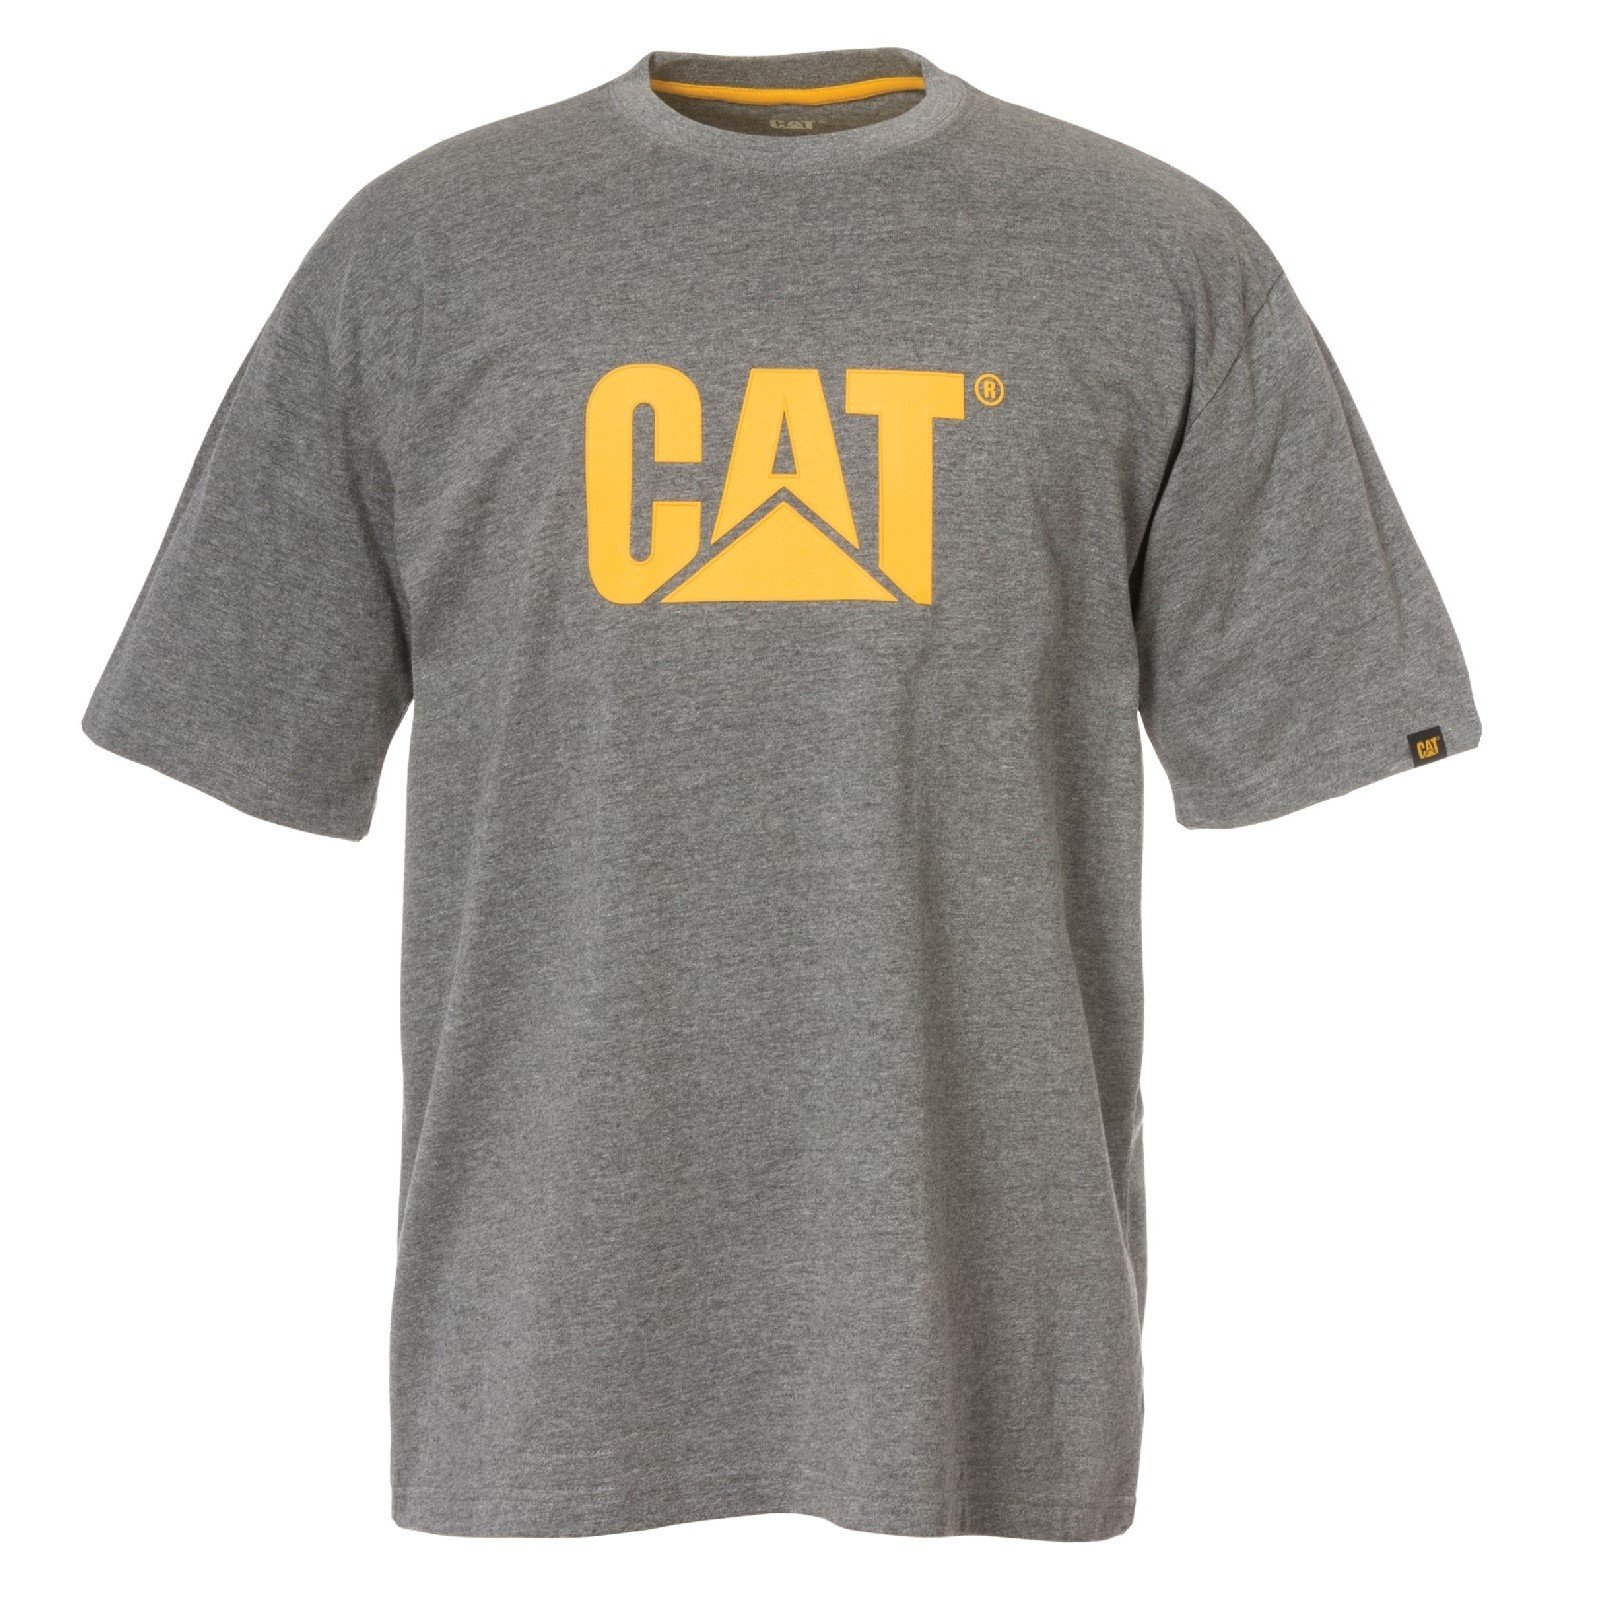 Caterpillar Men's Trademark Logo T-Shirt Various Colours 25301-42086 - Dark Heather Grey X